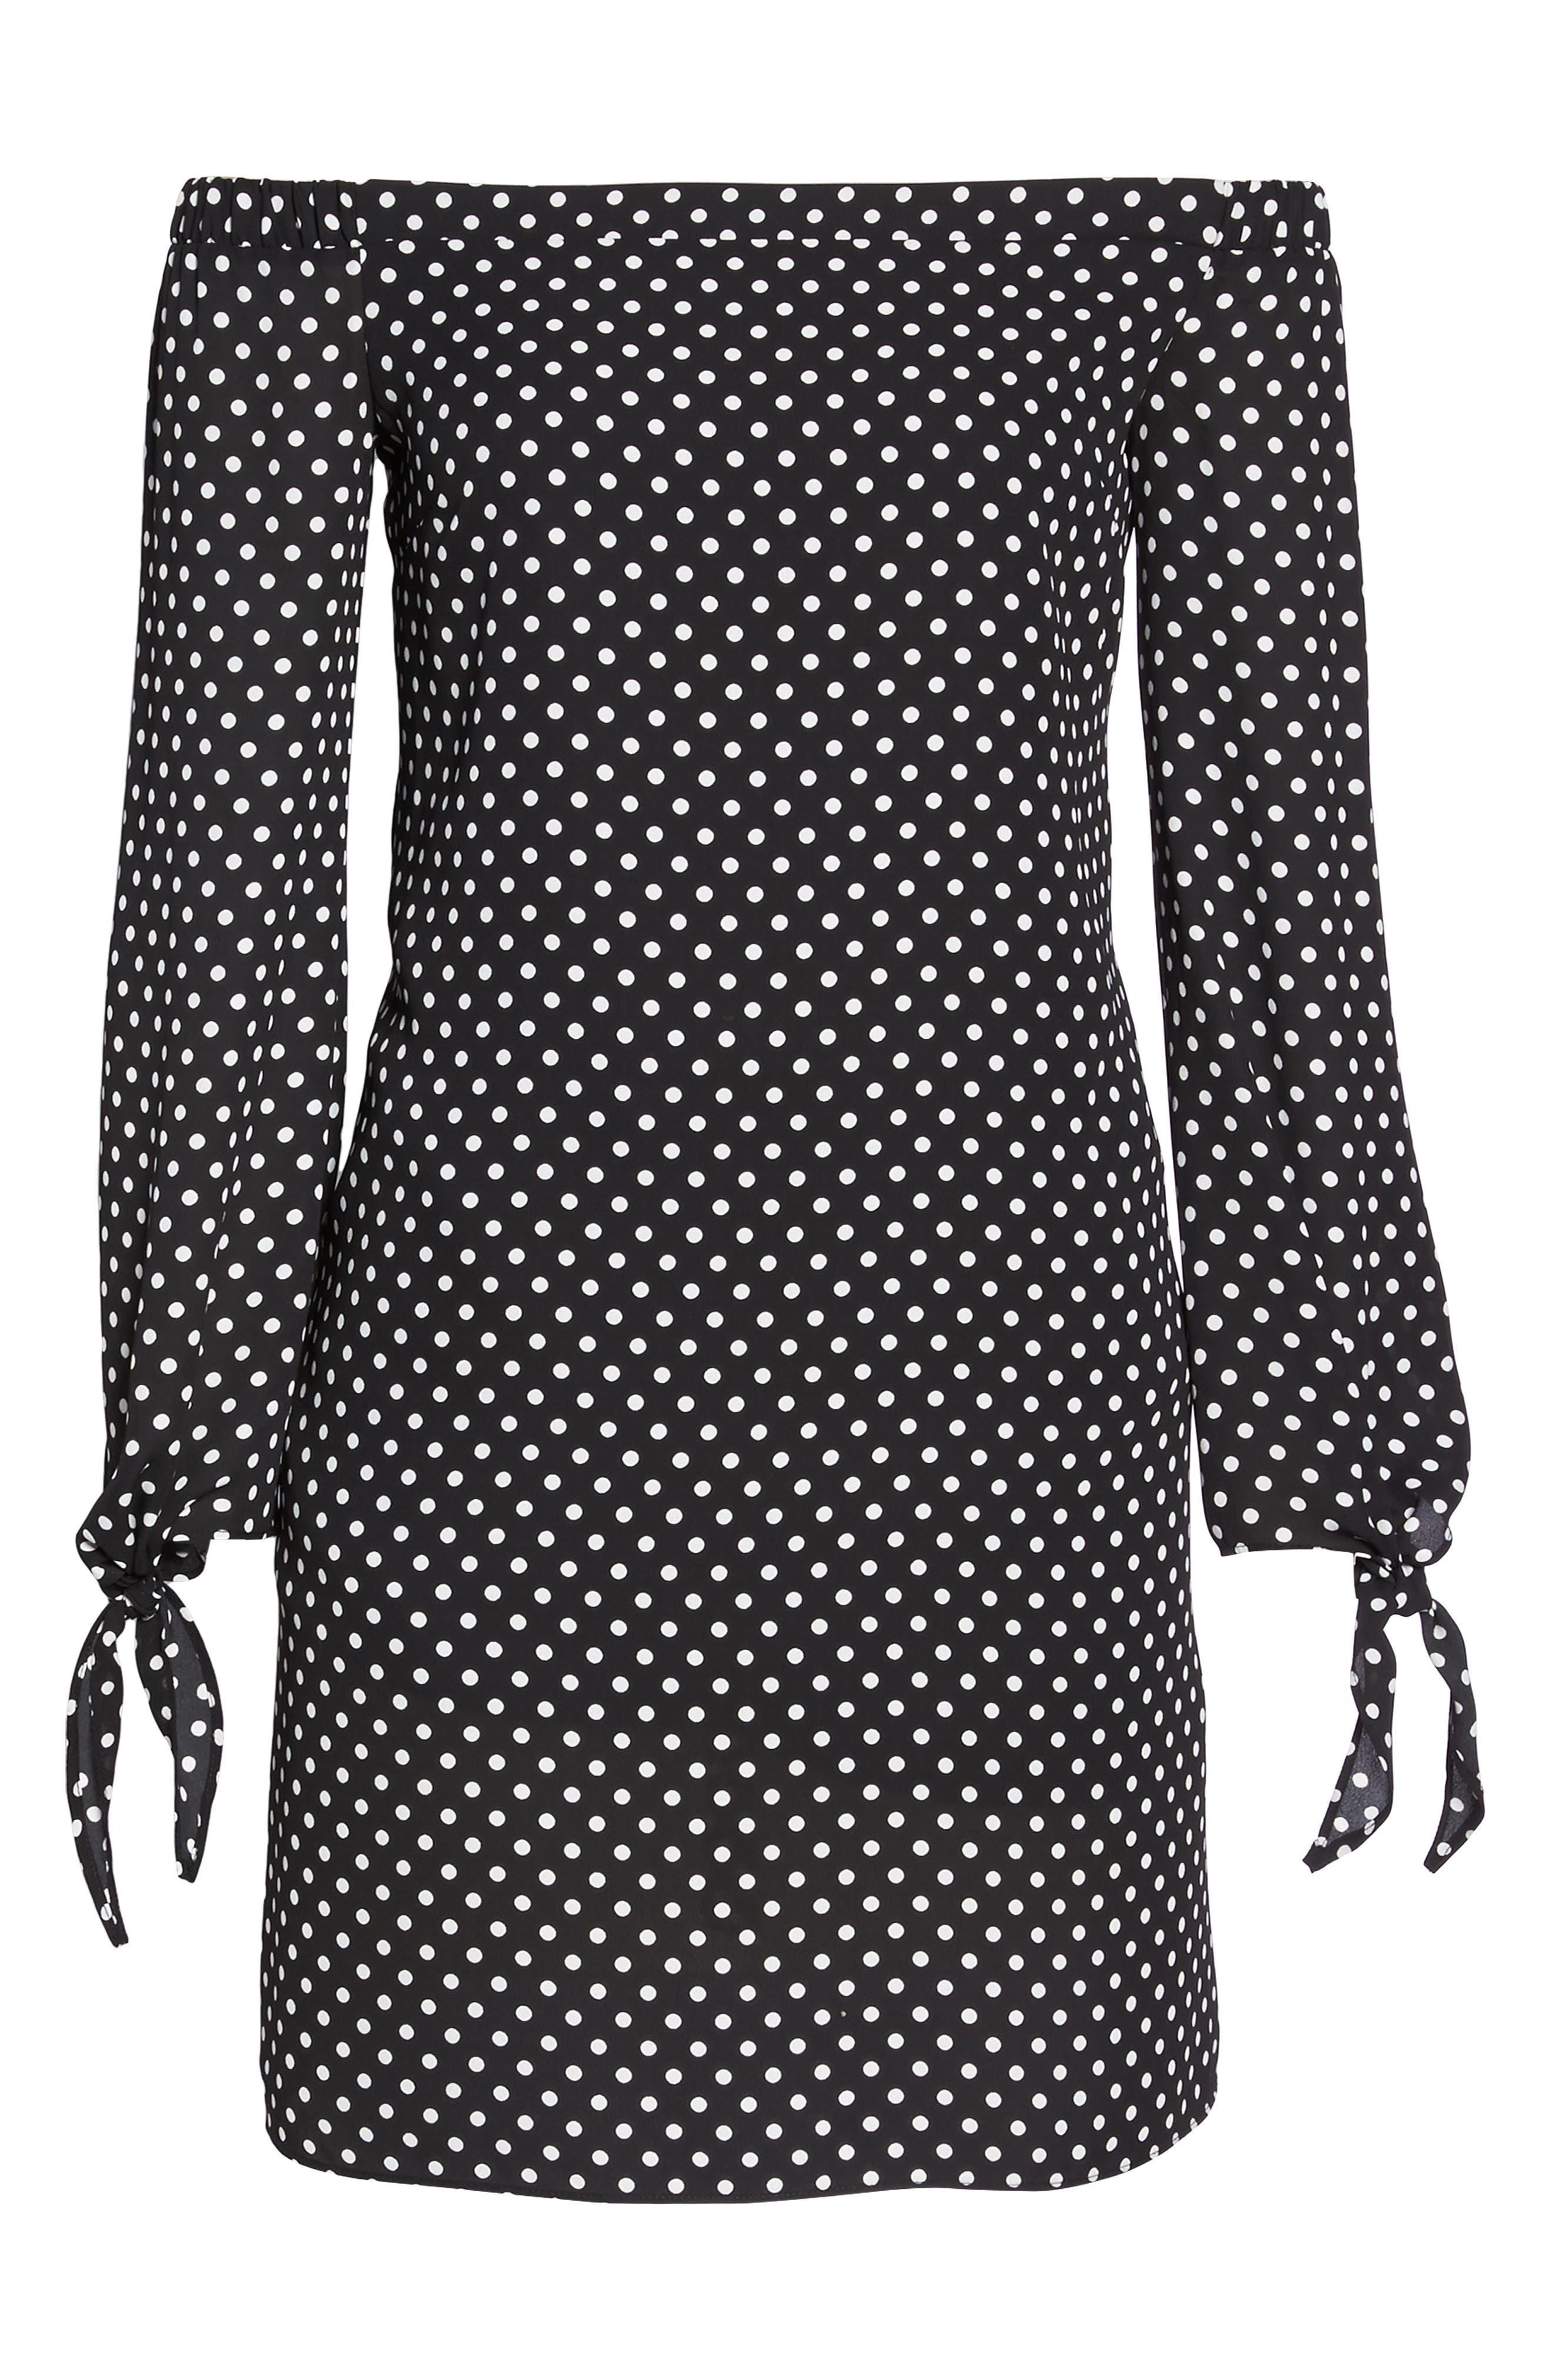 Polka Dot Off the Shoulder Minidress,                             Alternate thumbnail 6, color,                             Black/ White